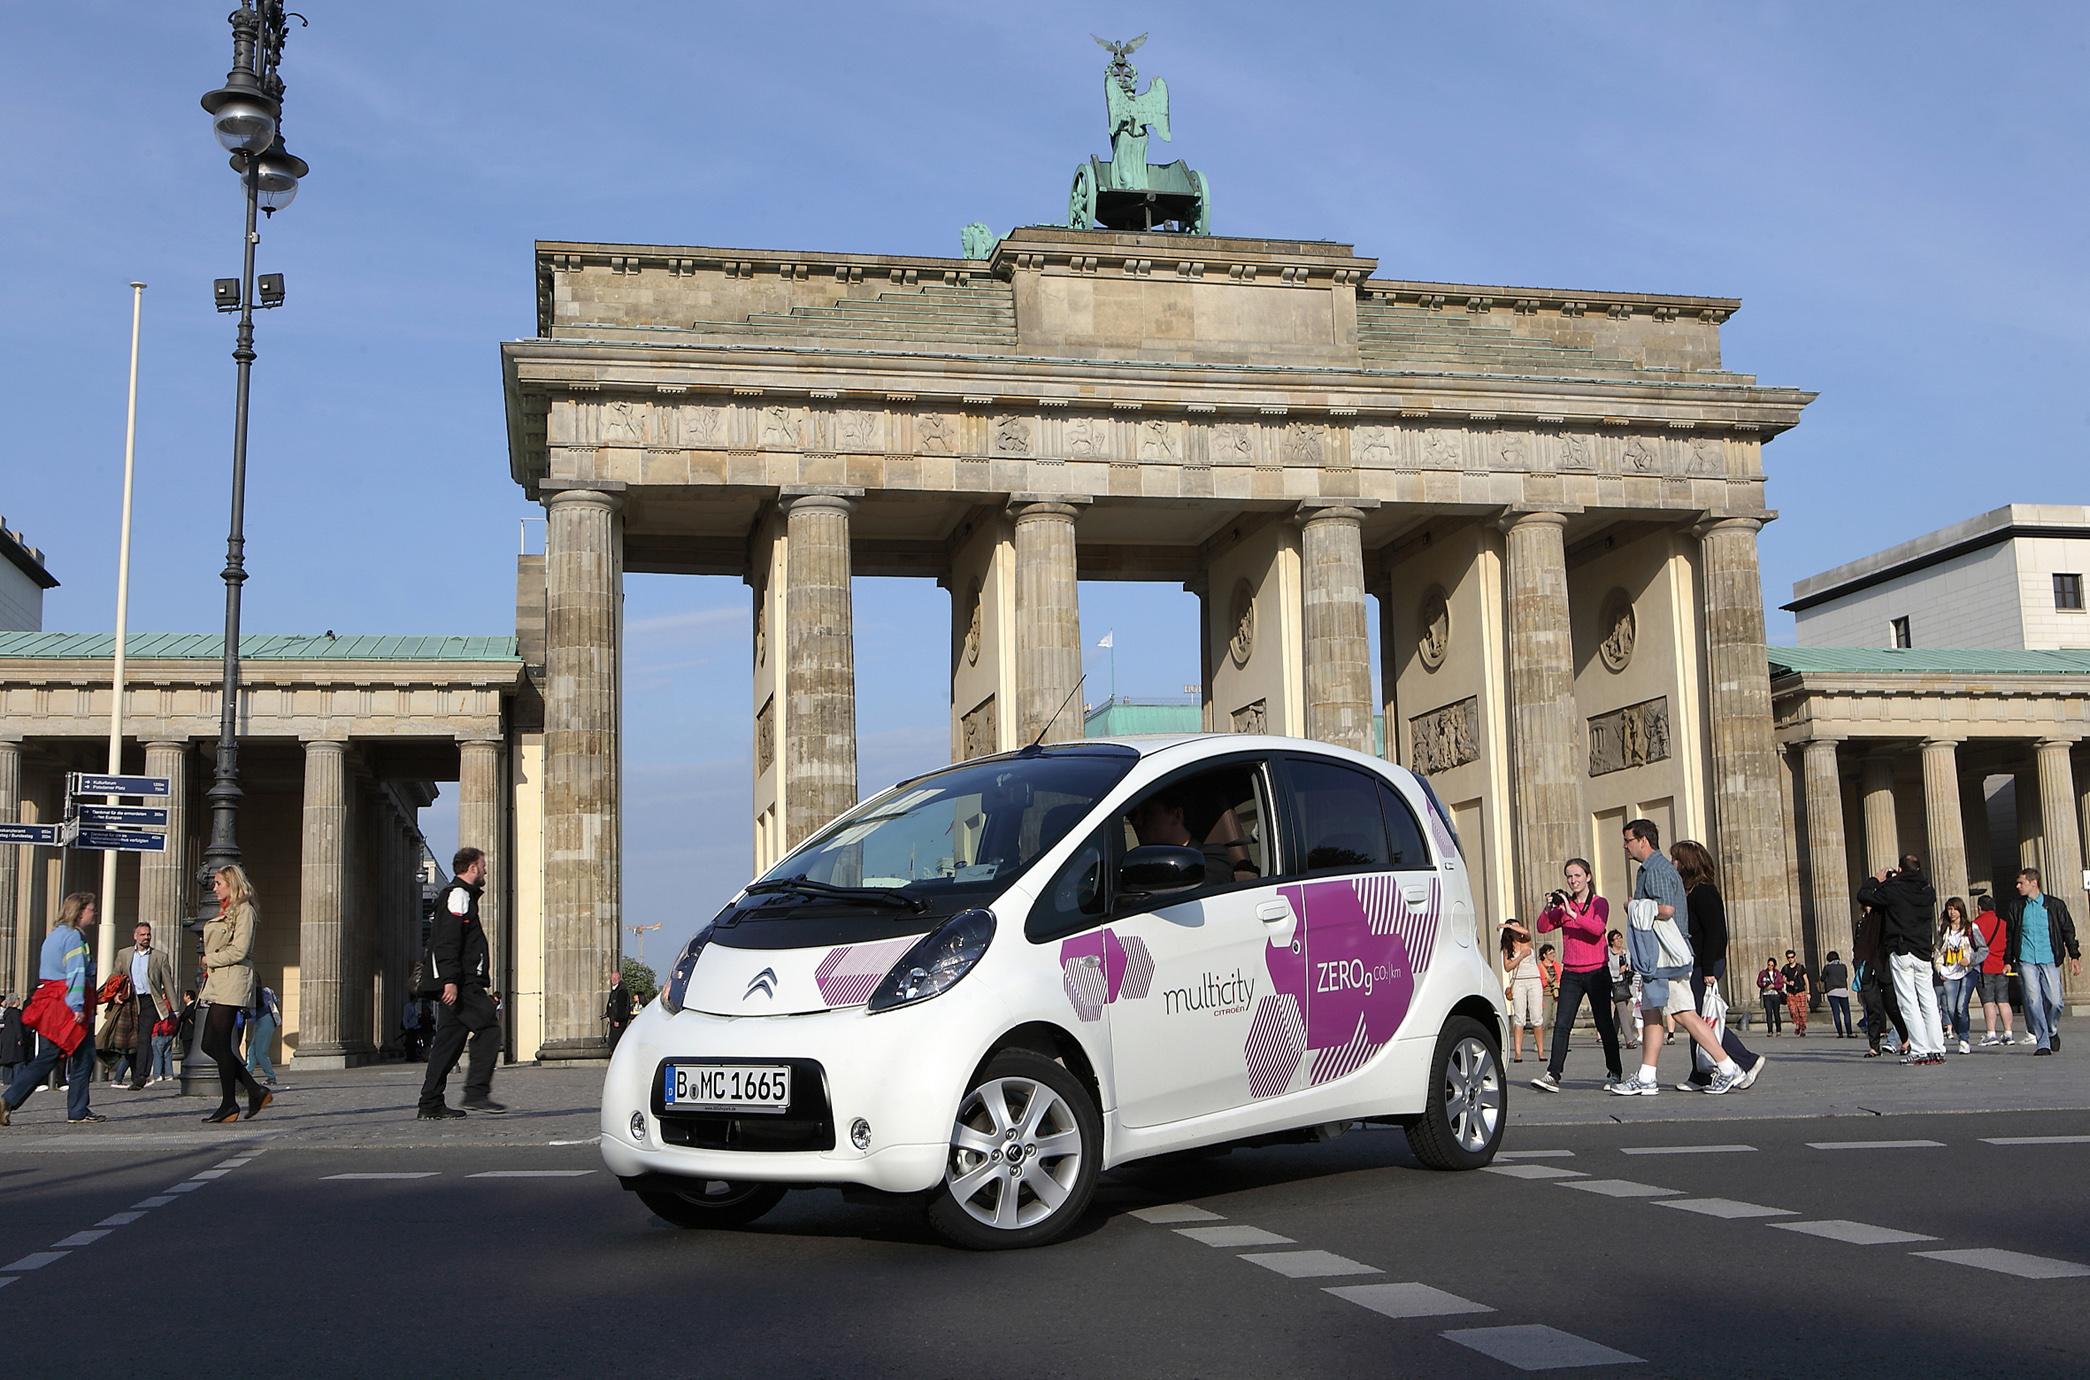 Citroën Multicity Elektro-Carsharing: Registrierung ab sofort möglich